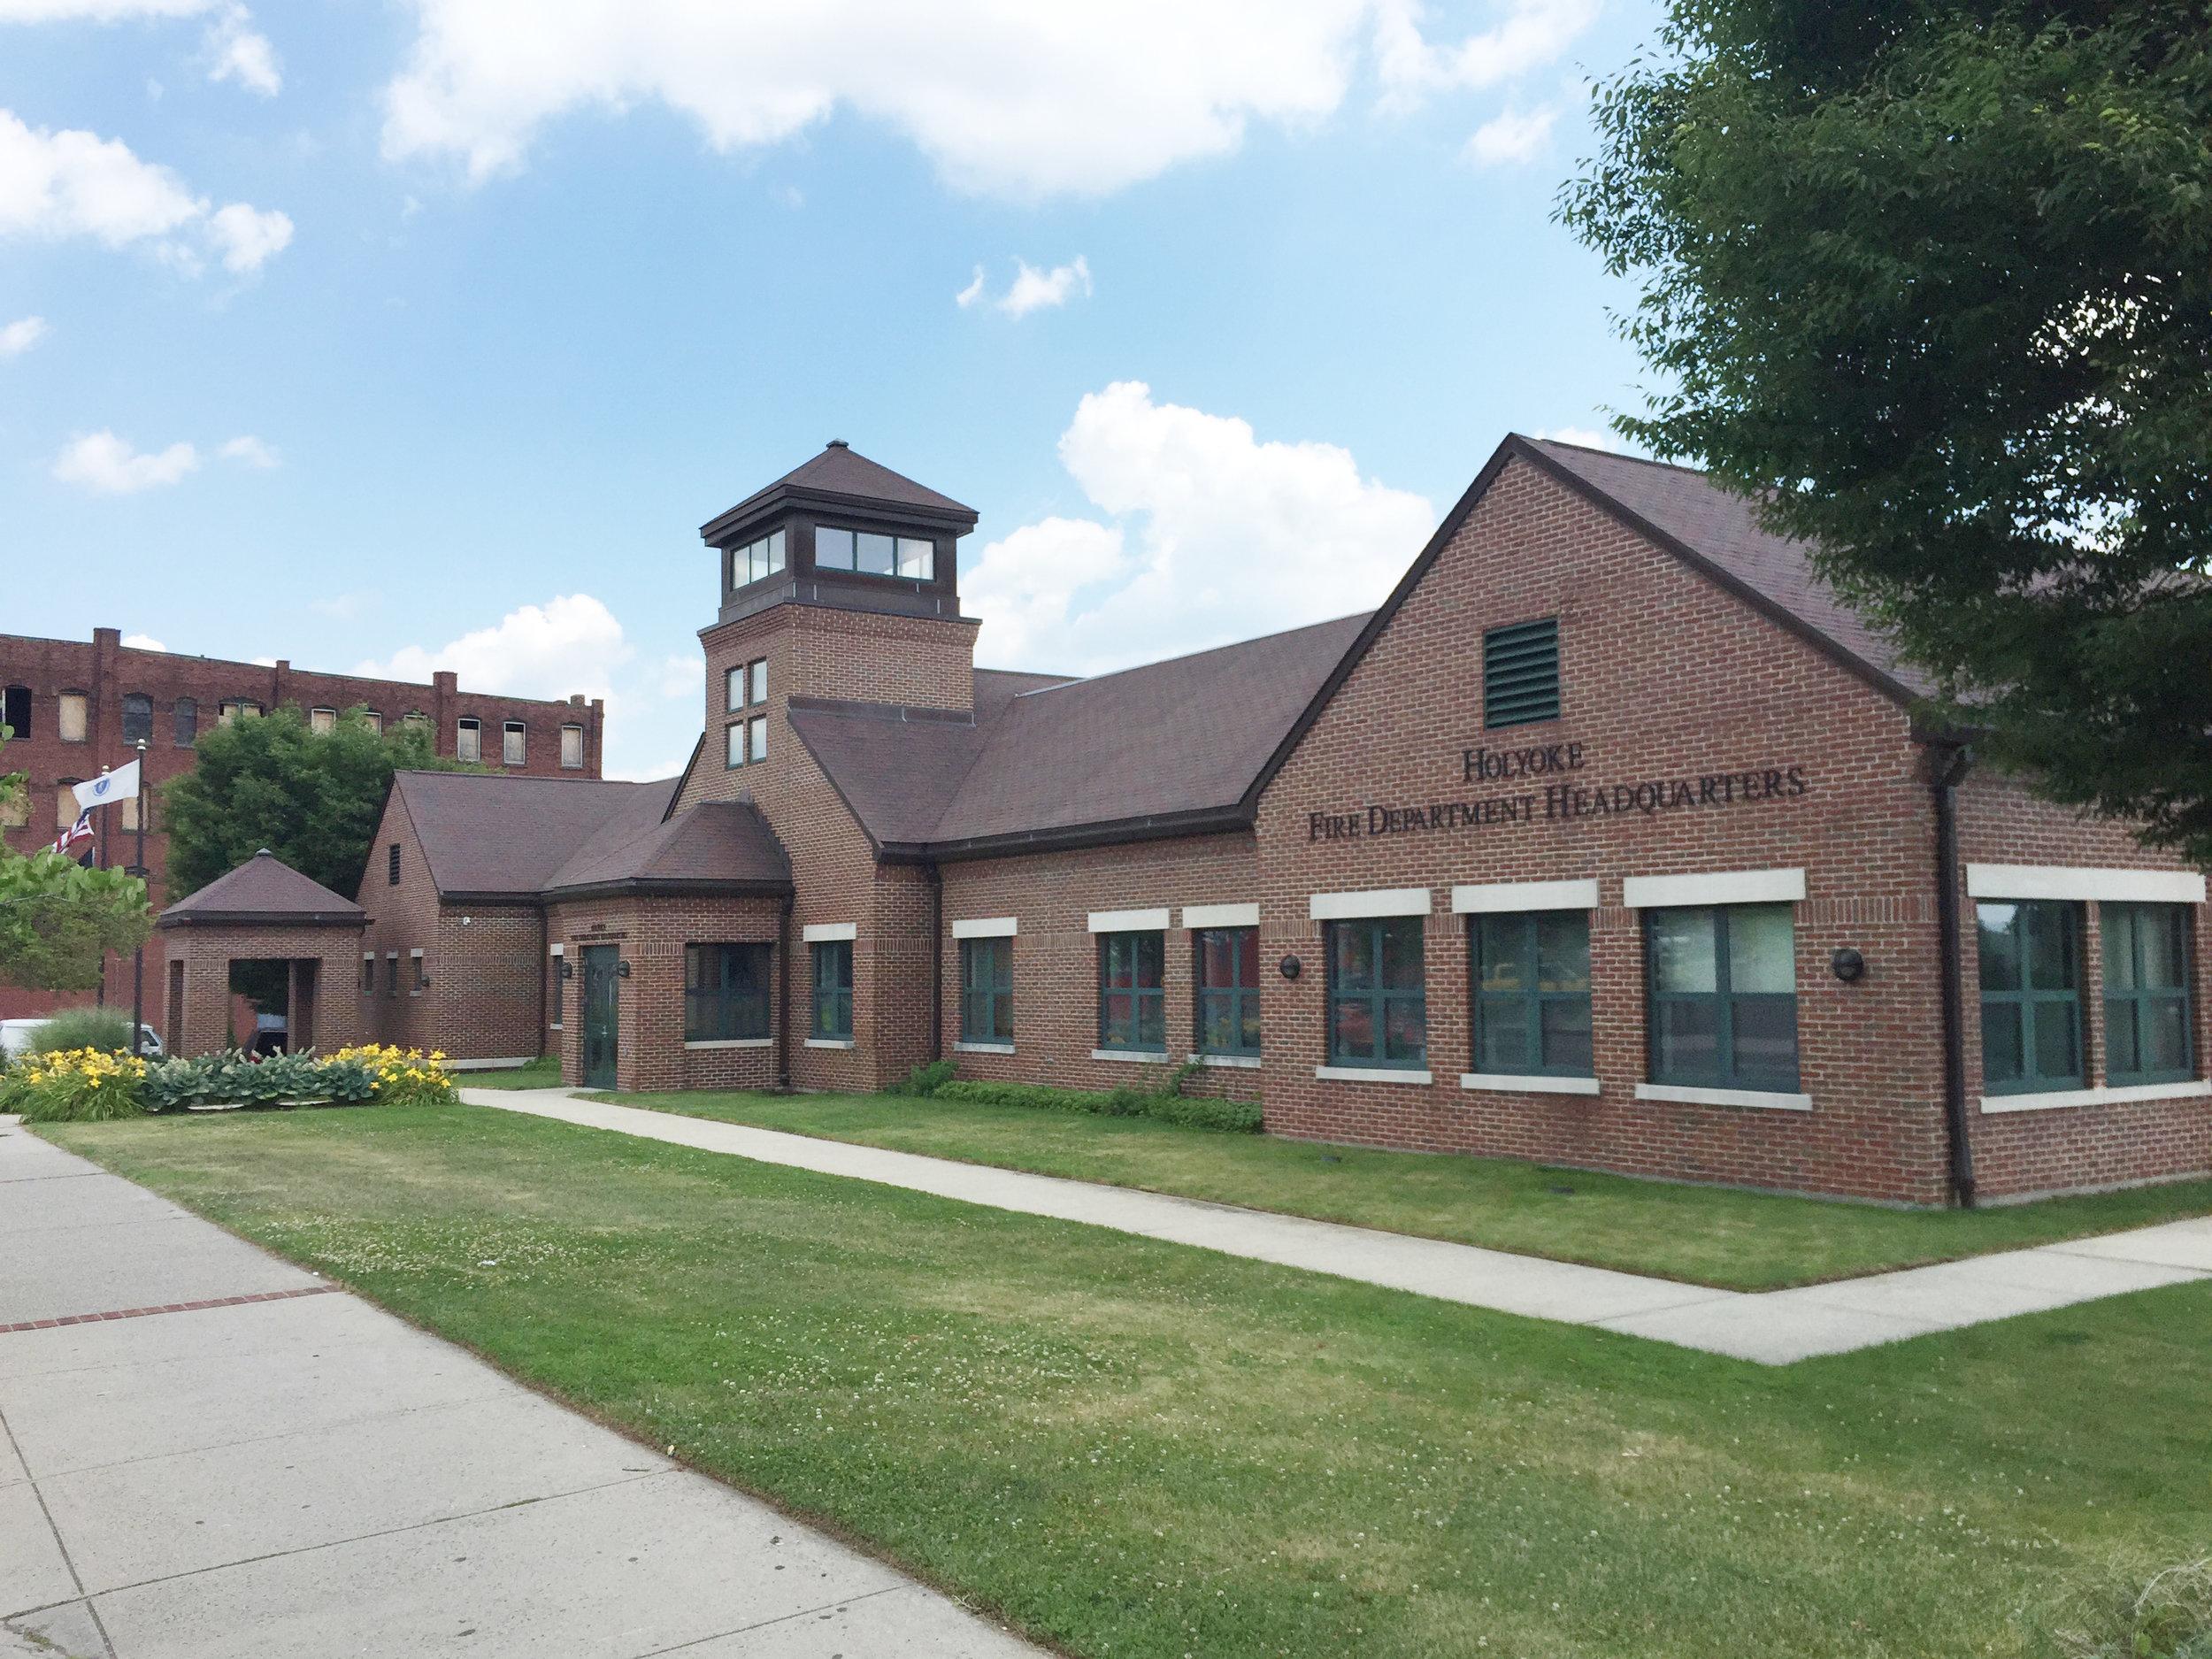 Holyoke Fire Department Headquarters